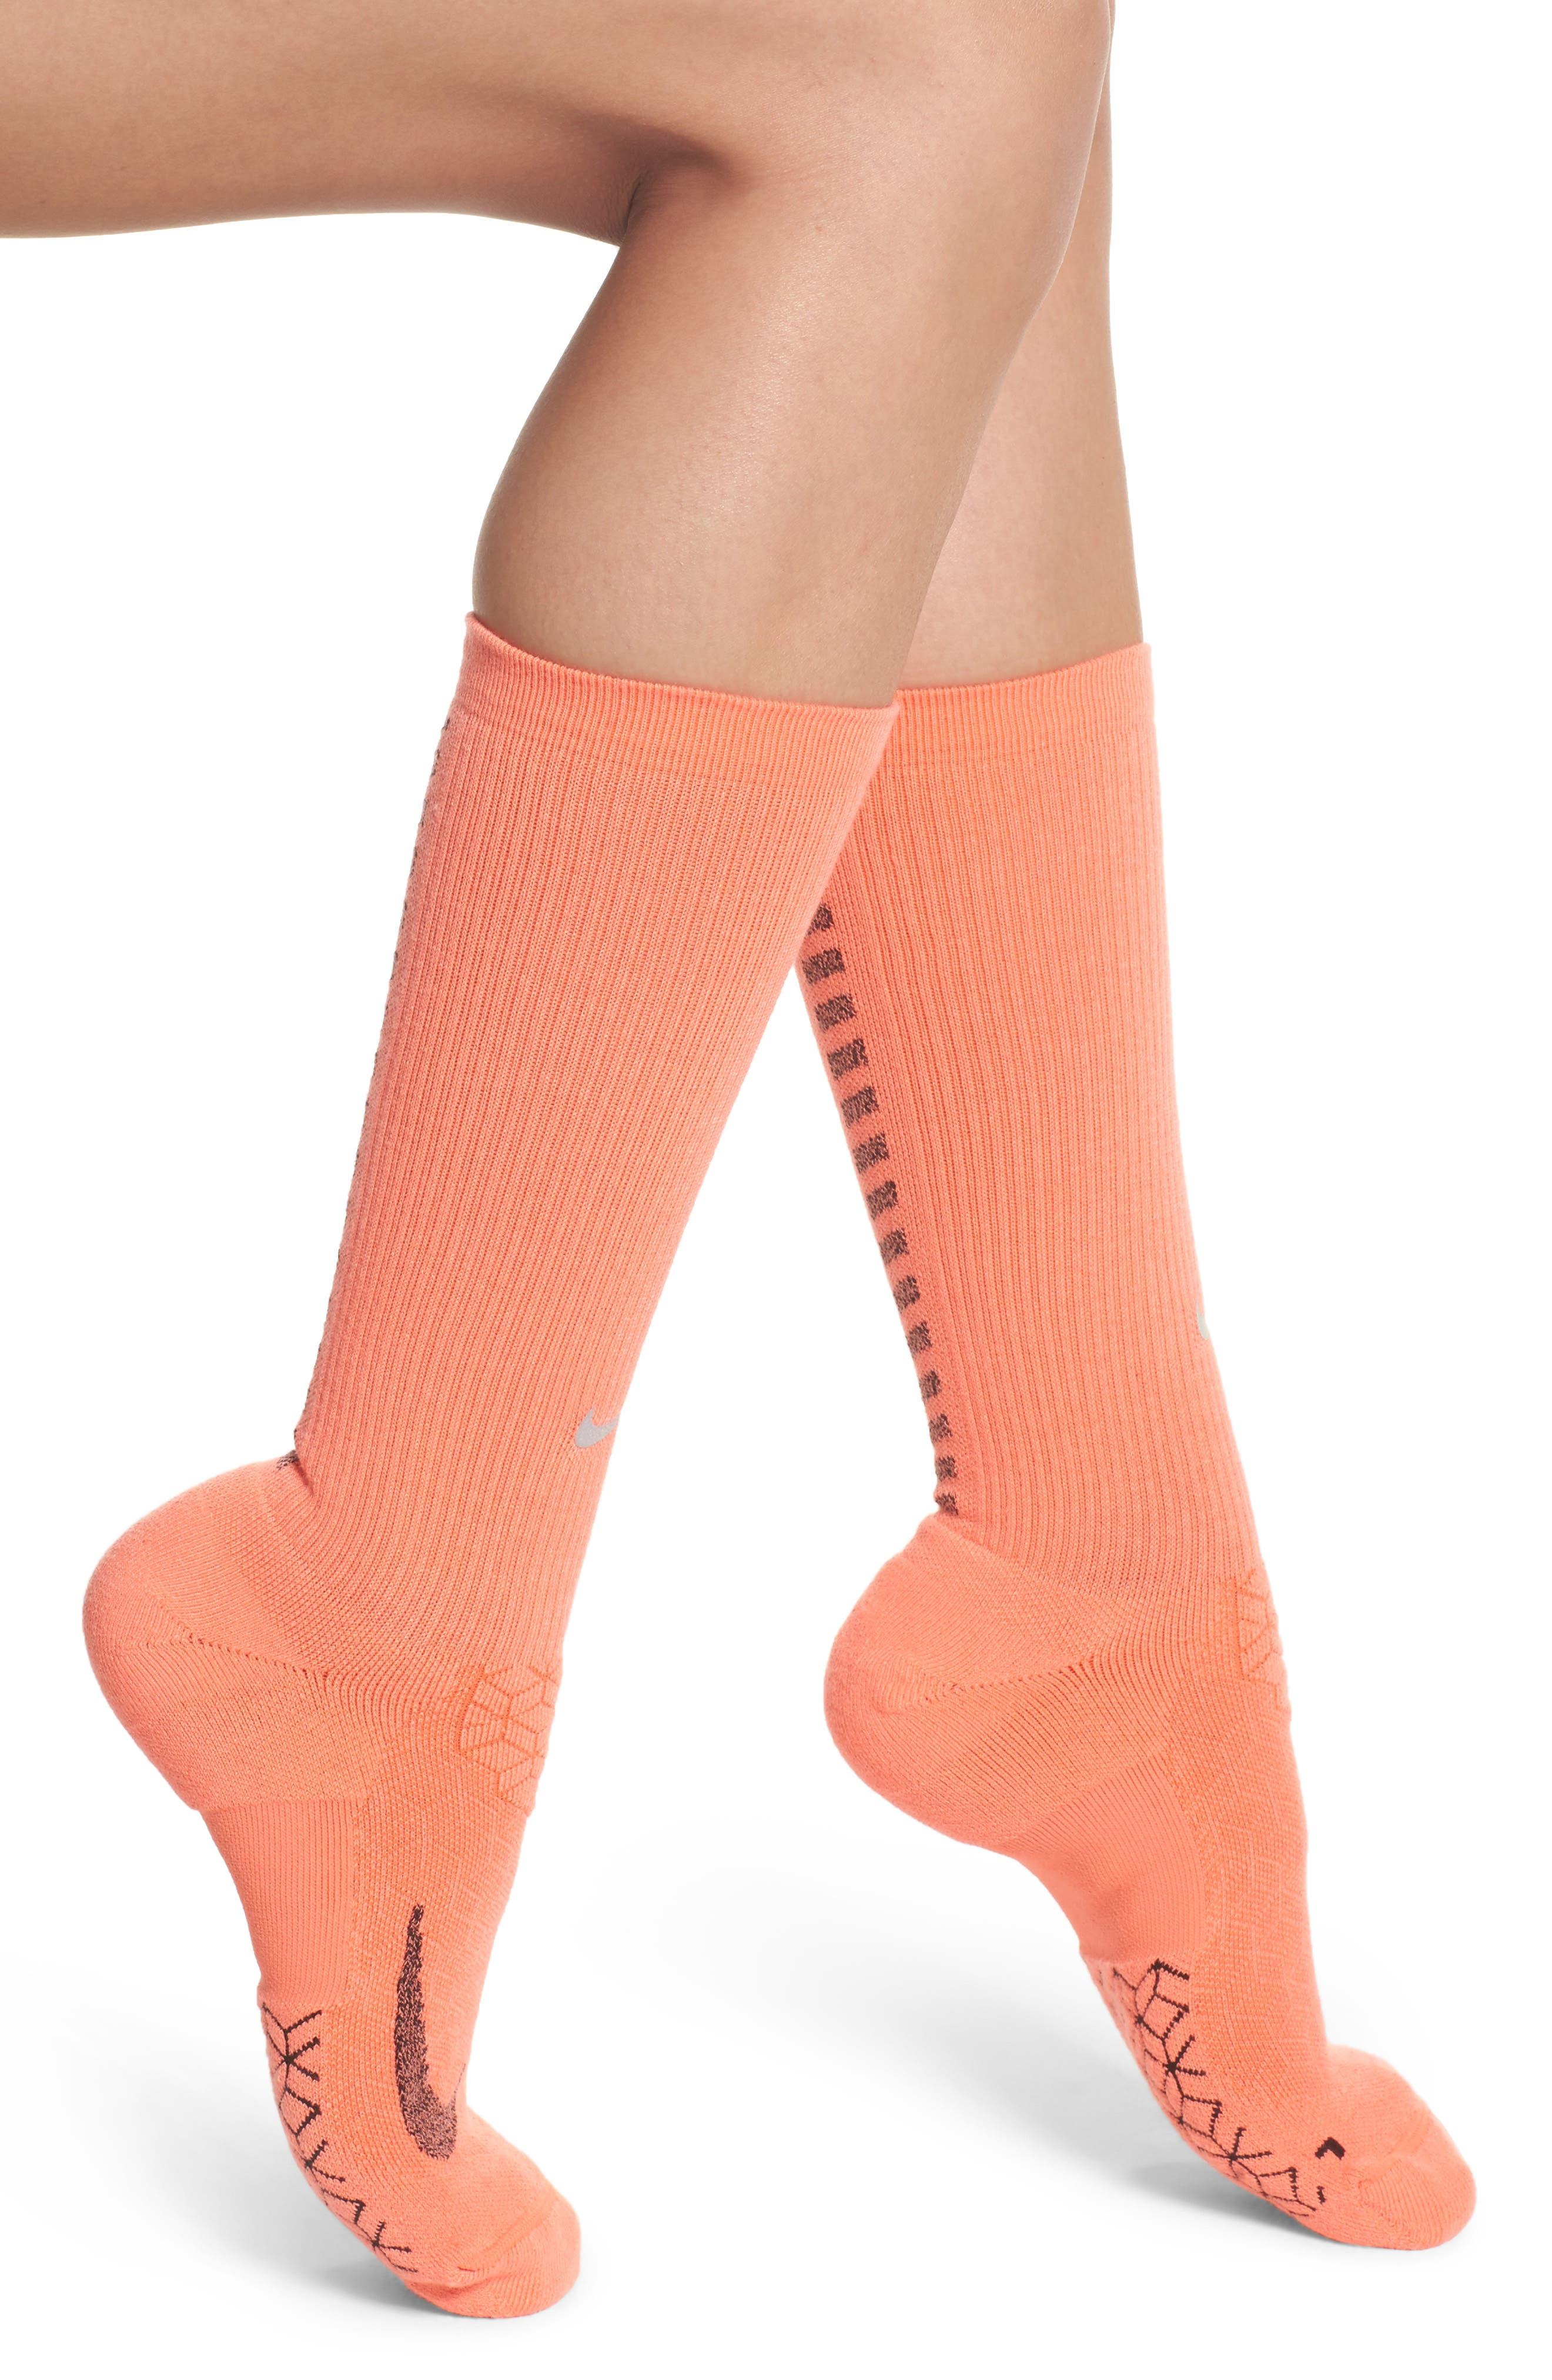 Elite Cushioned Running Crew Socks,                         Main,                         color, Light Wild Mango/ Black